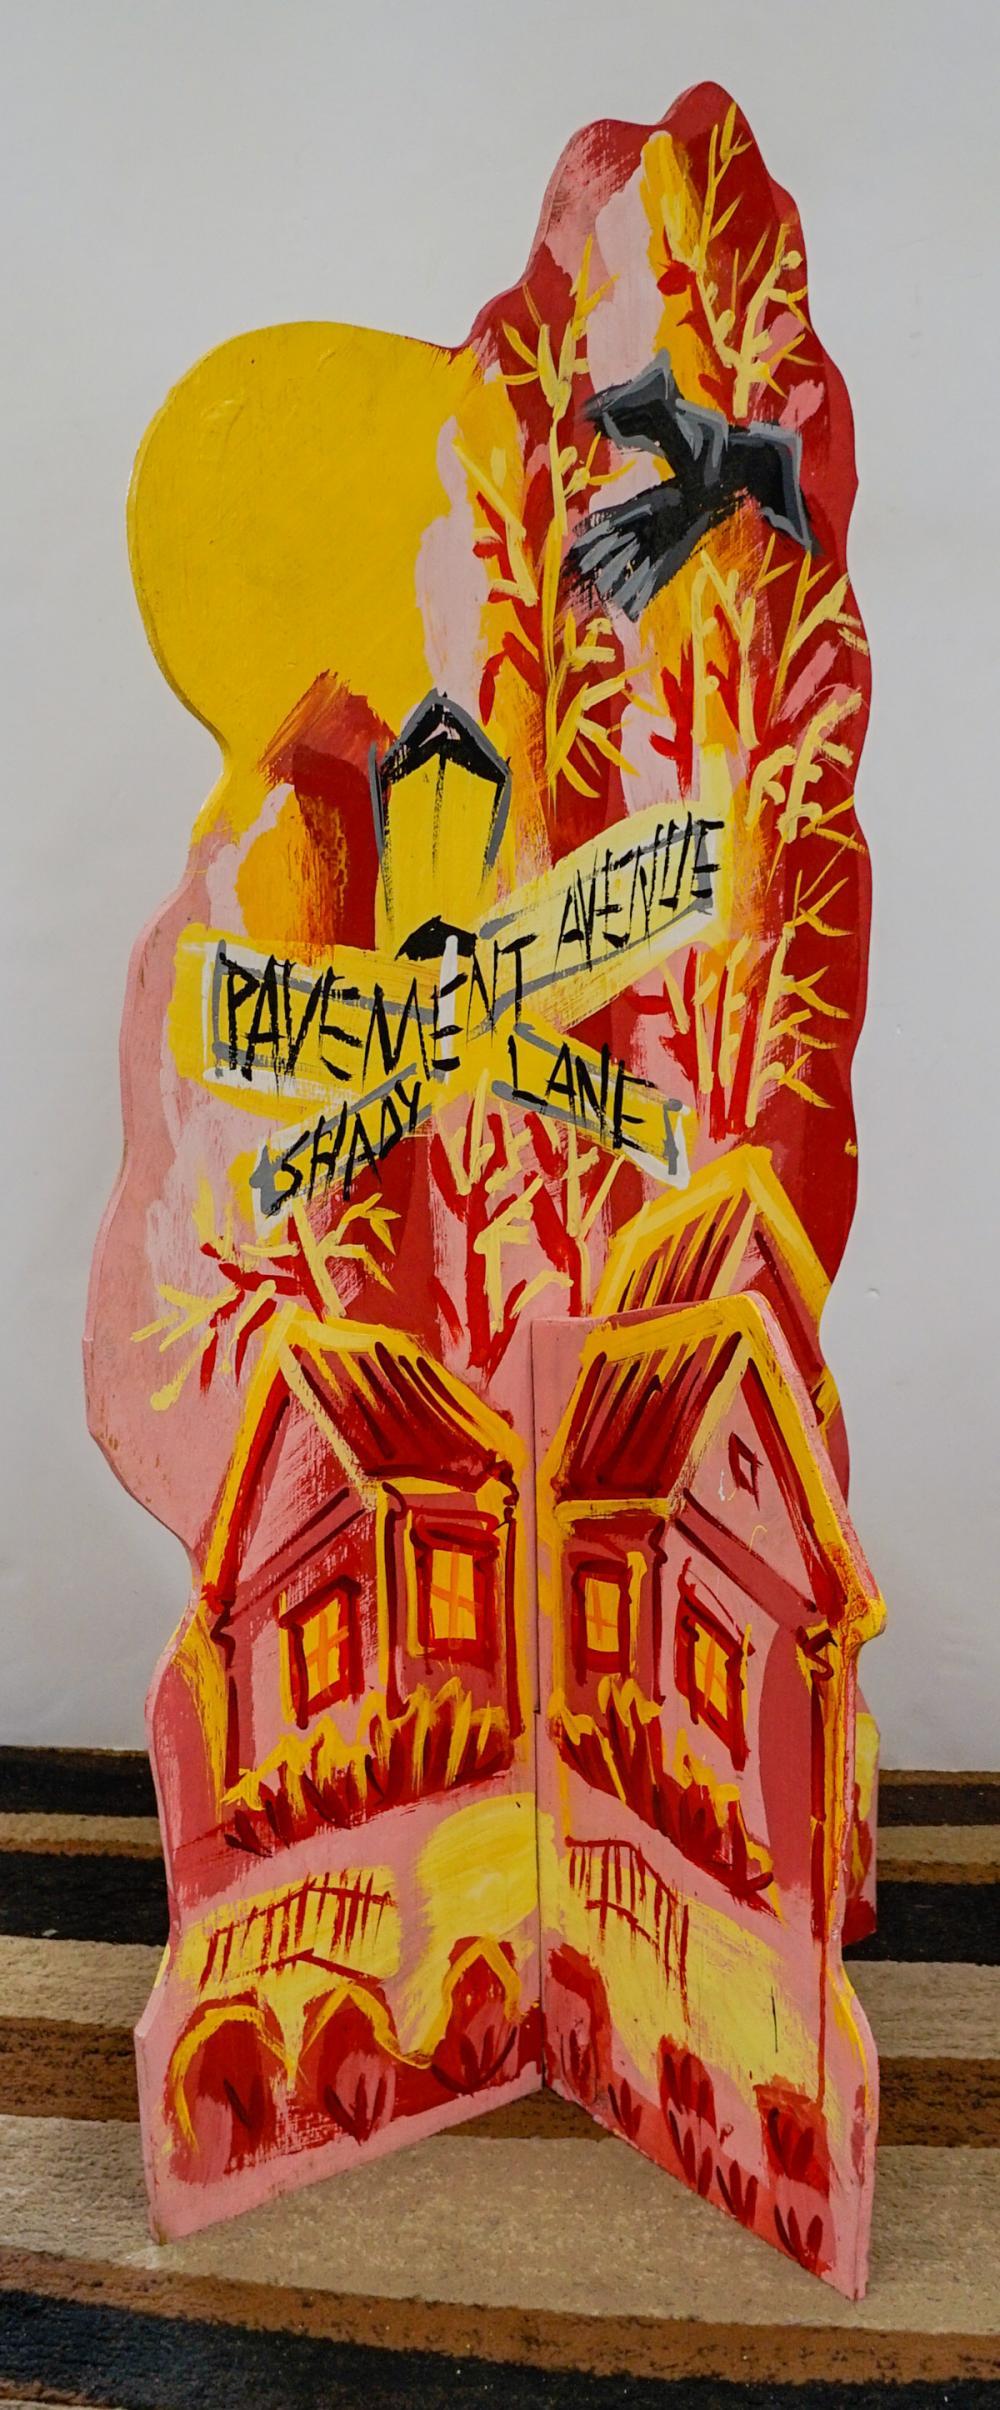 Pavement, Shady Lane Record Store Display